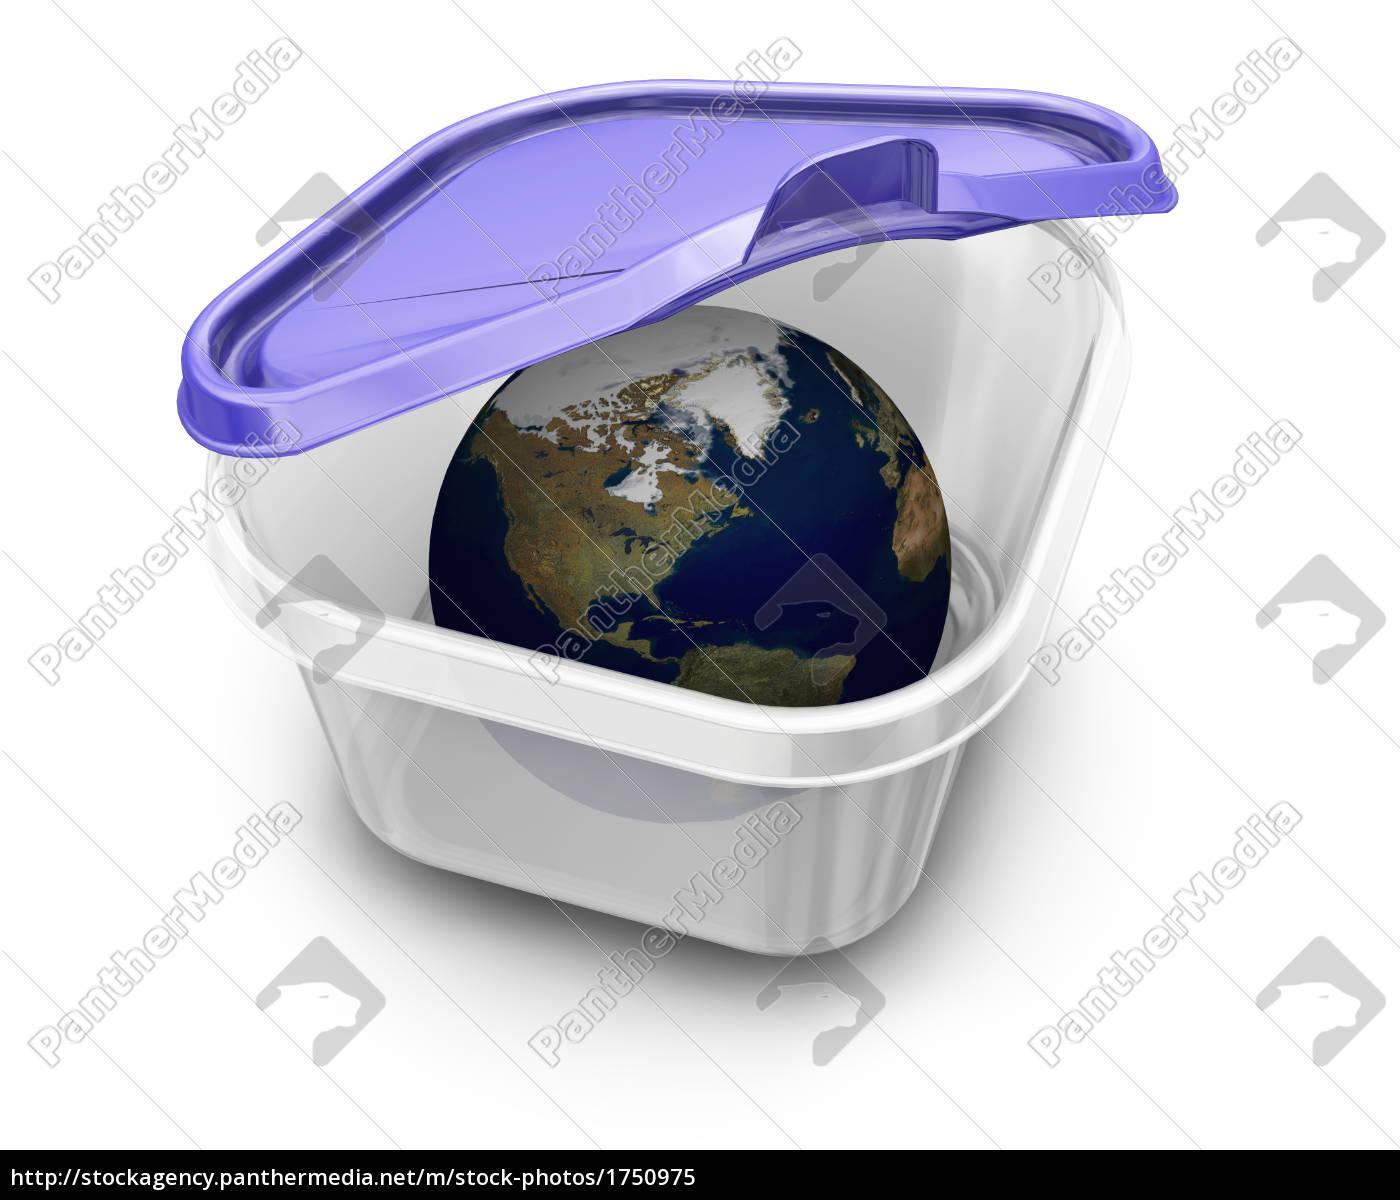 world, in, a, box - 1750975